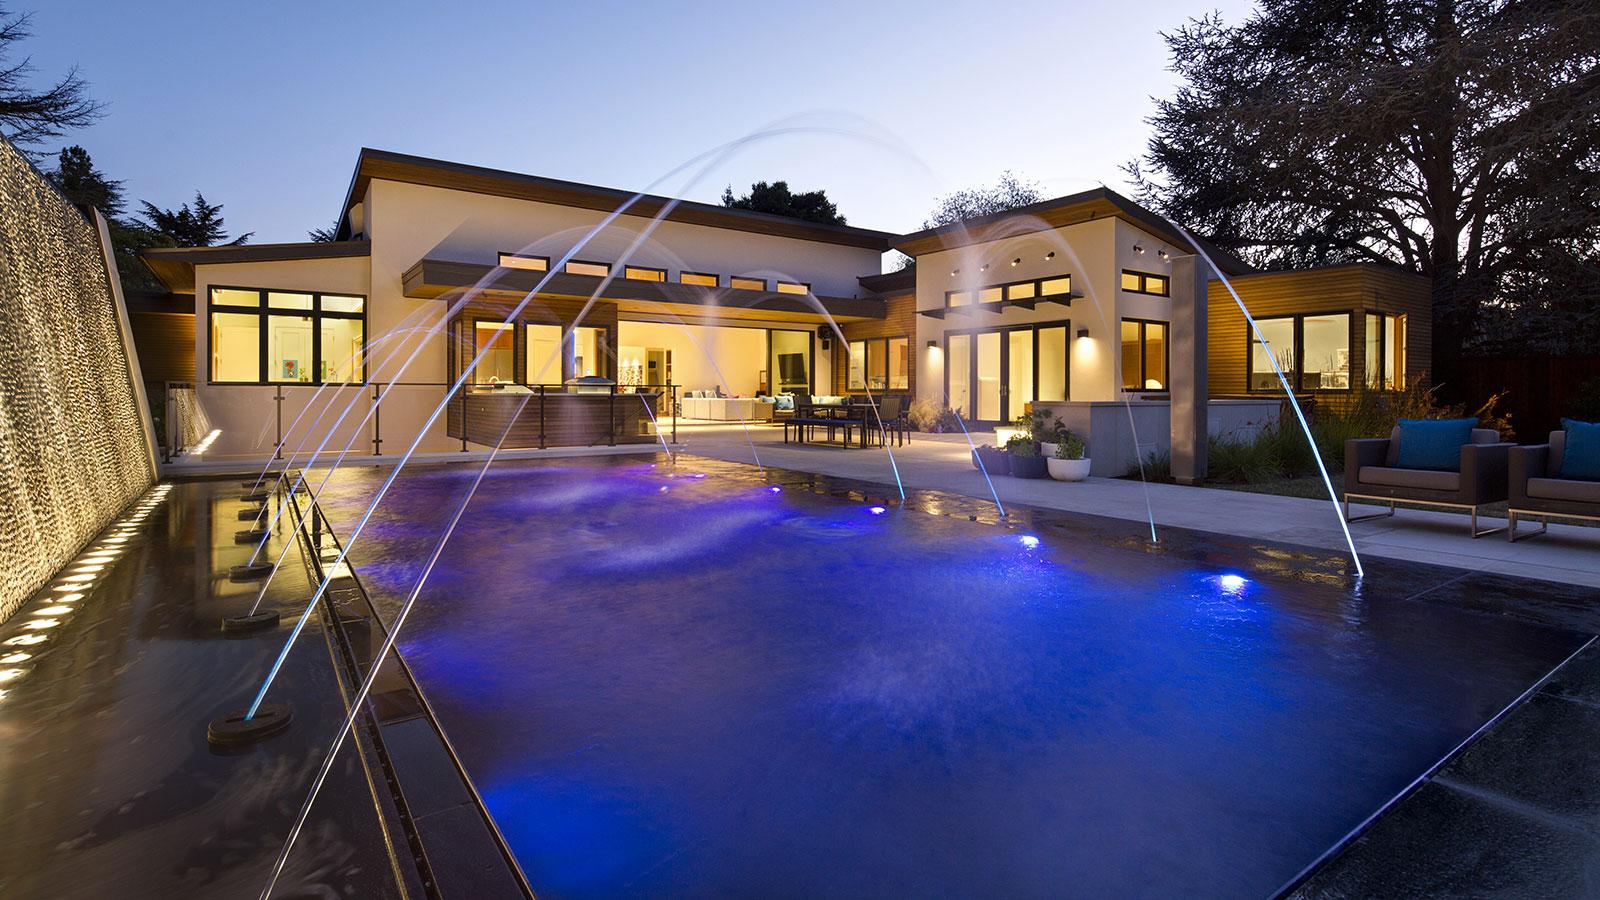 Centerspas construction de piscine spas saunas et hammam for Piscine sauna hammam